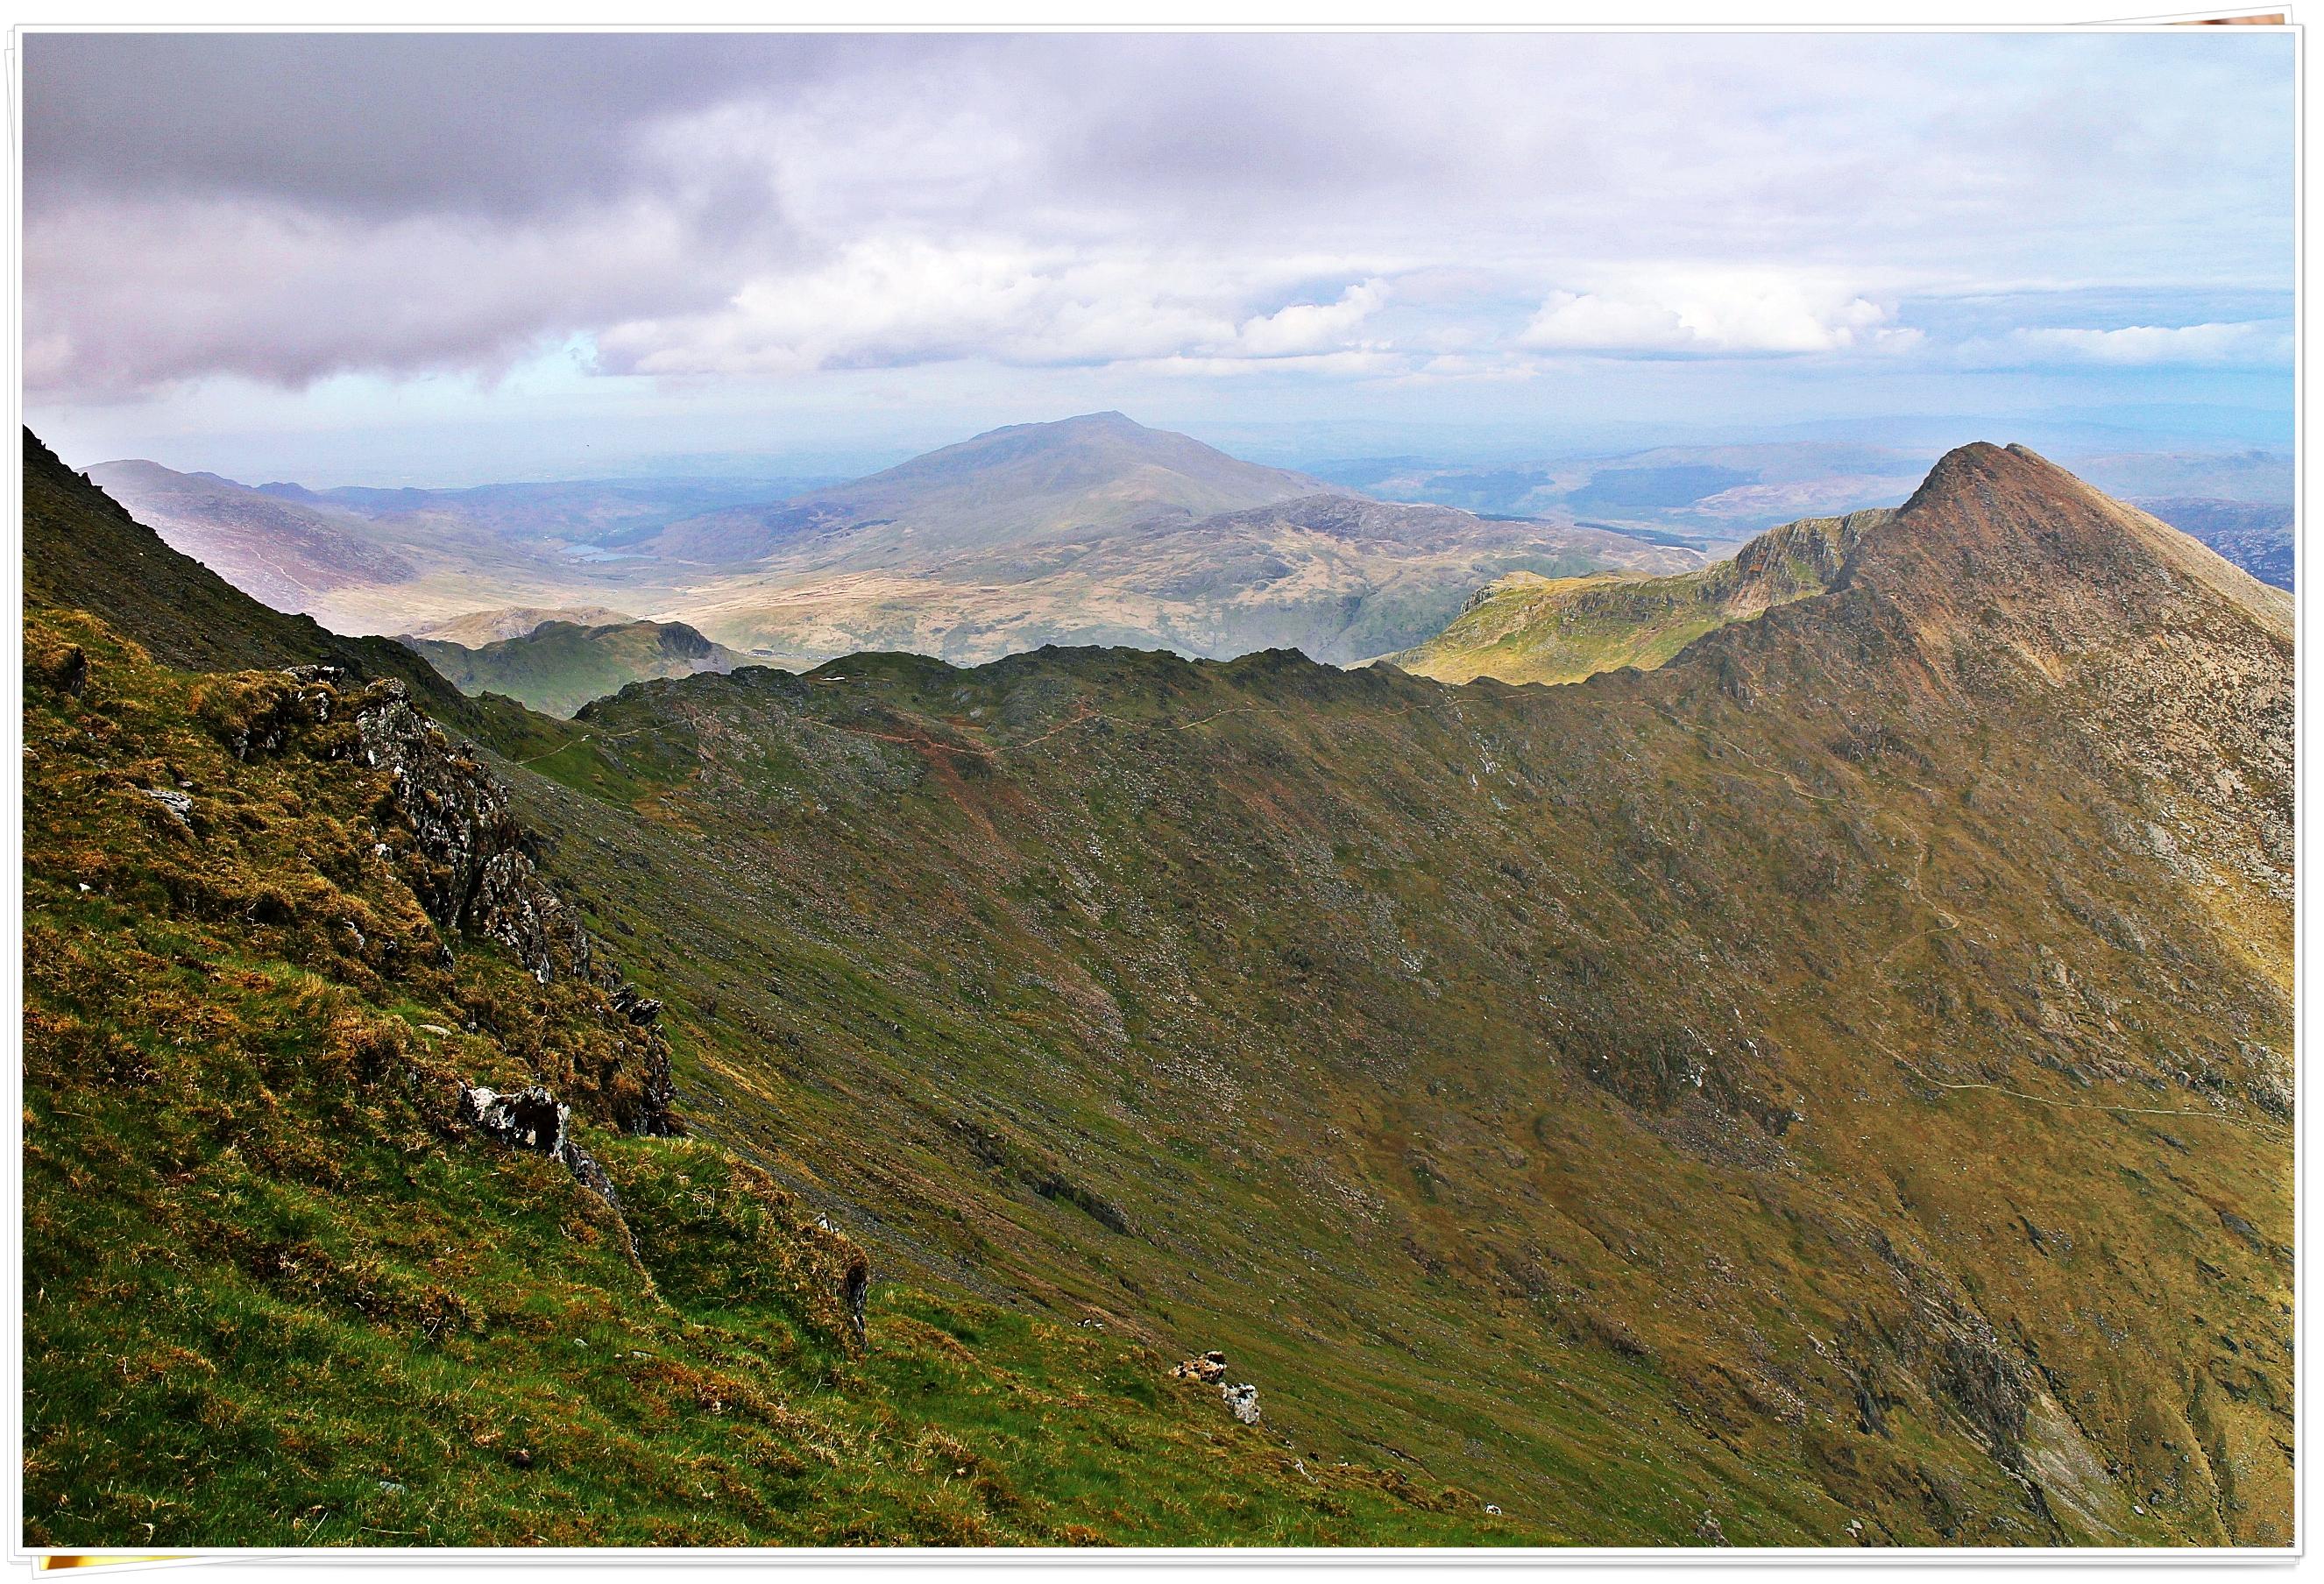 Mt. Snowdon, Wales - 2015